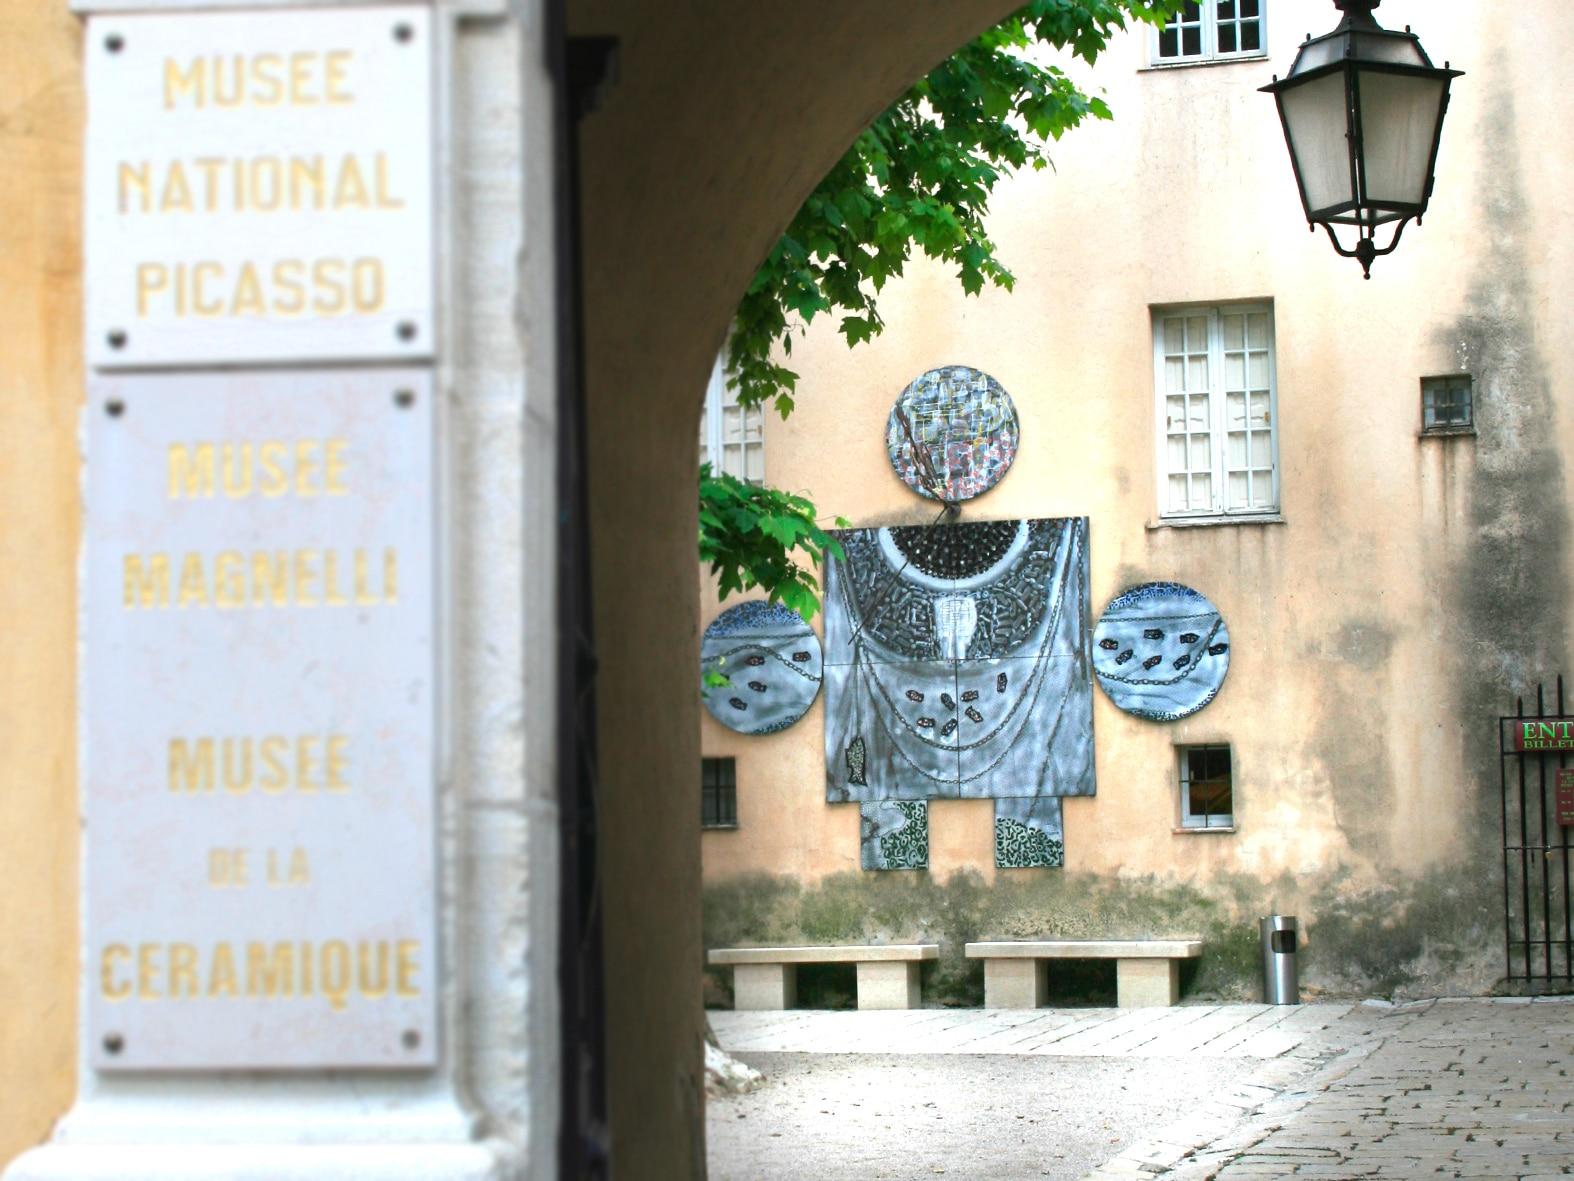 Château-Musée Vallauris